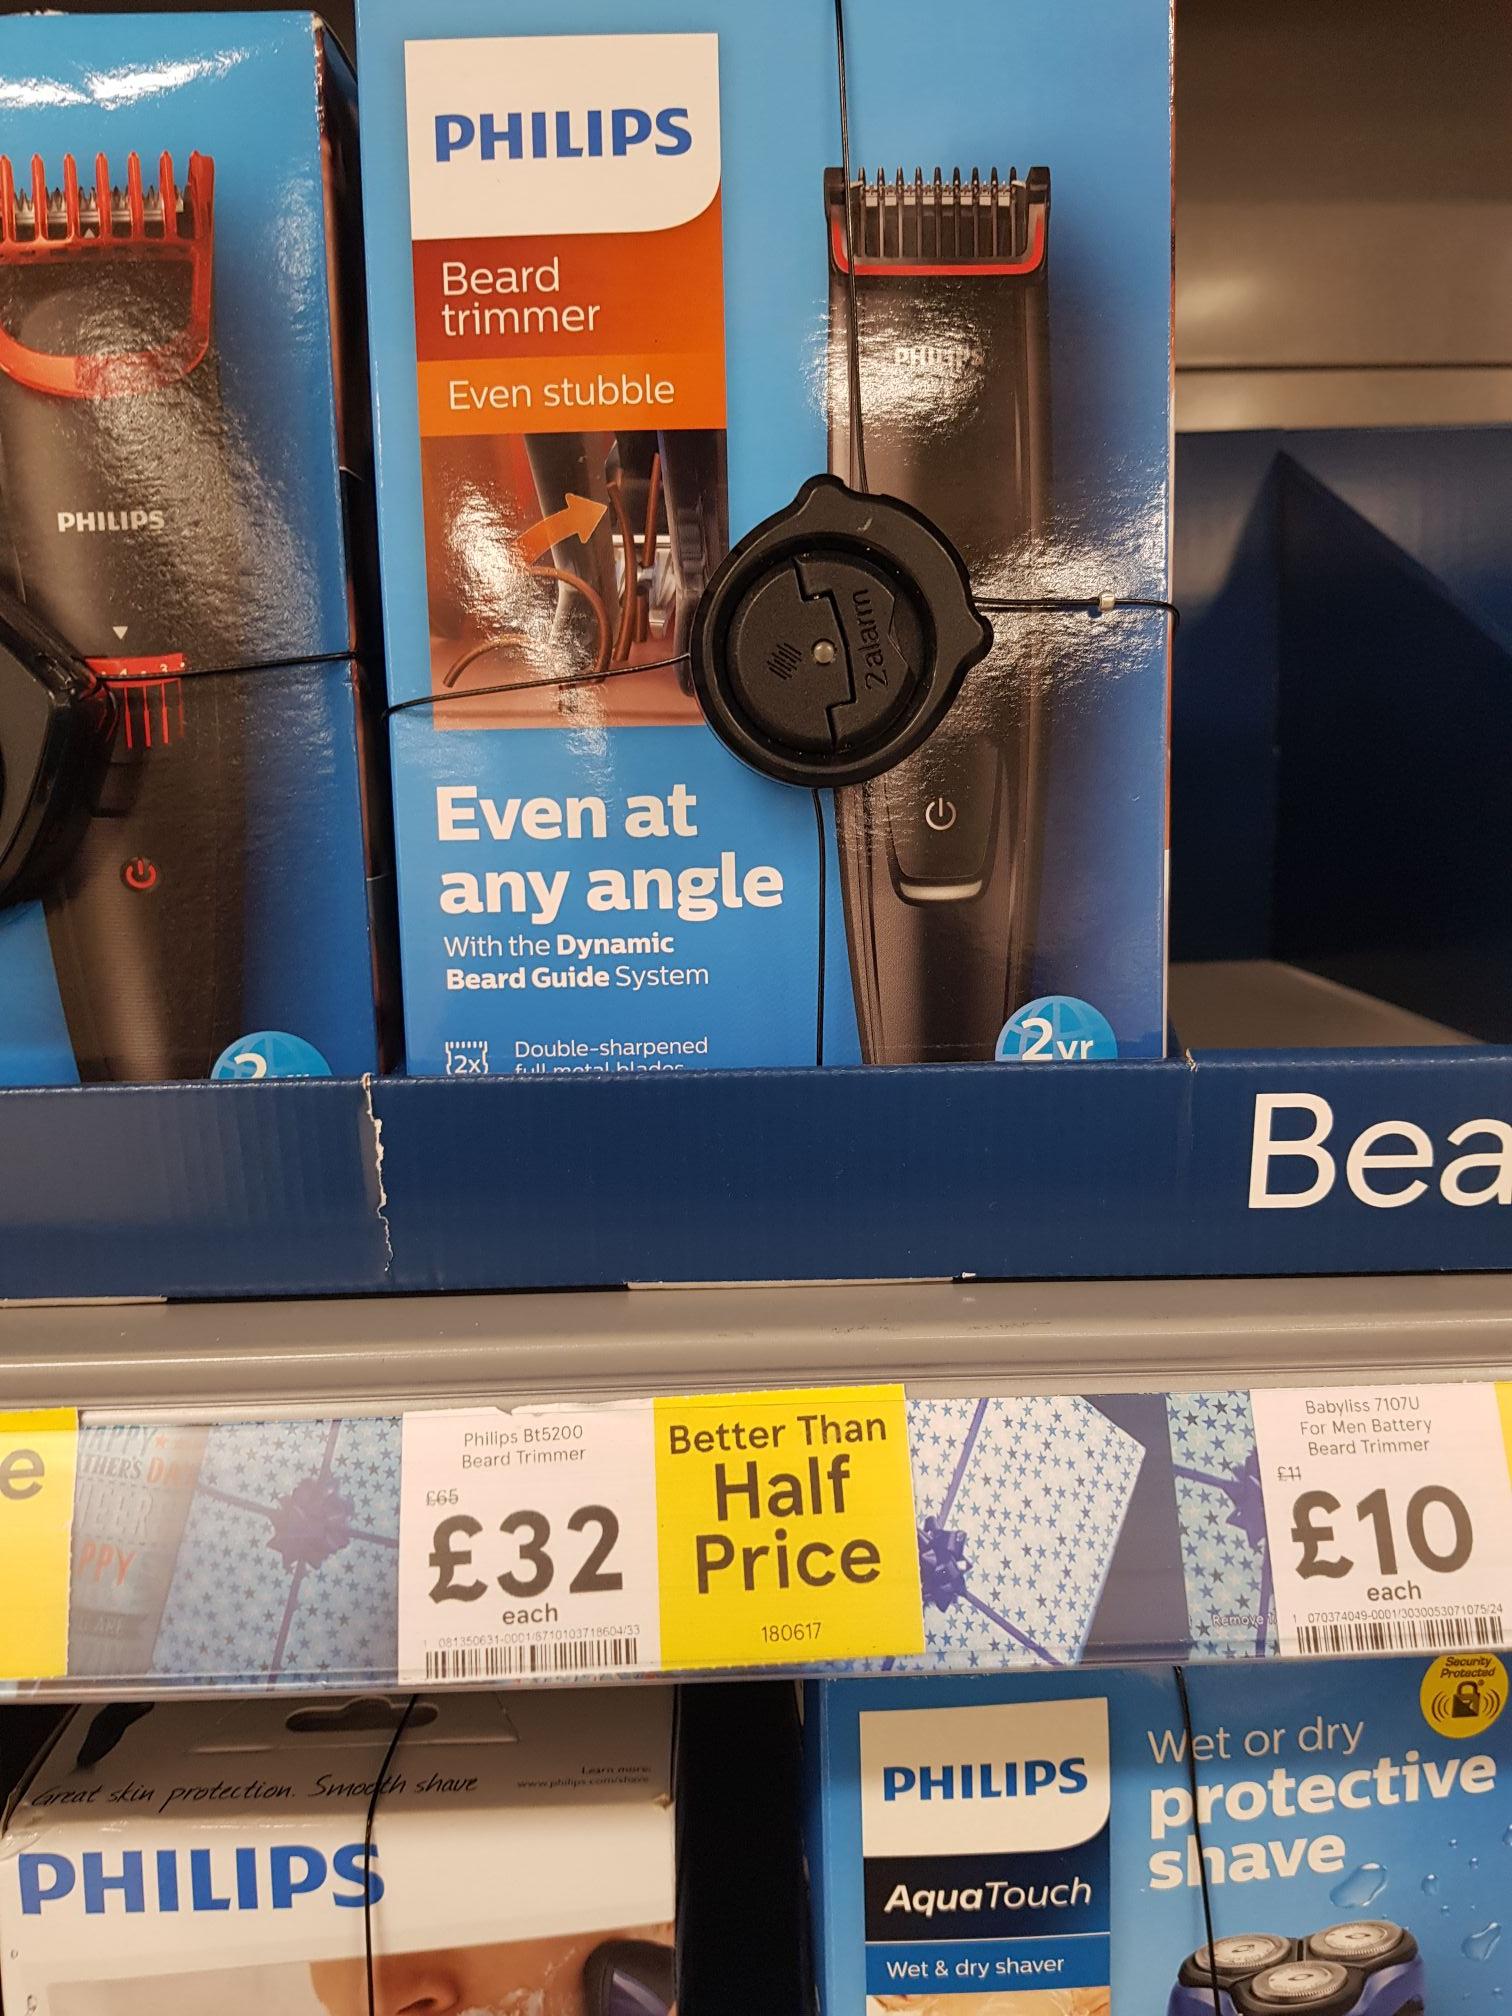 Better than half price Philips BT5200 trimmer @Tesco instore - £32